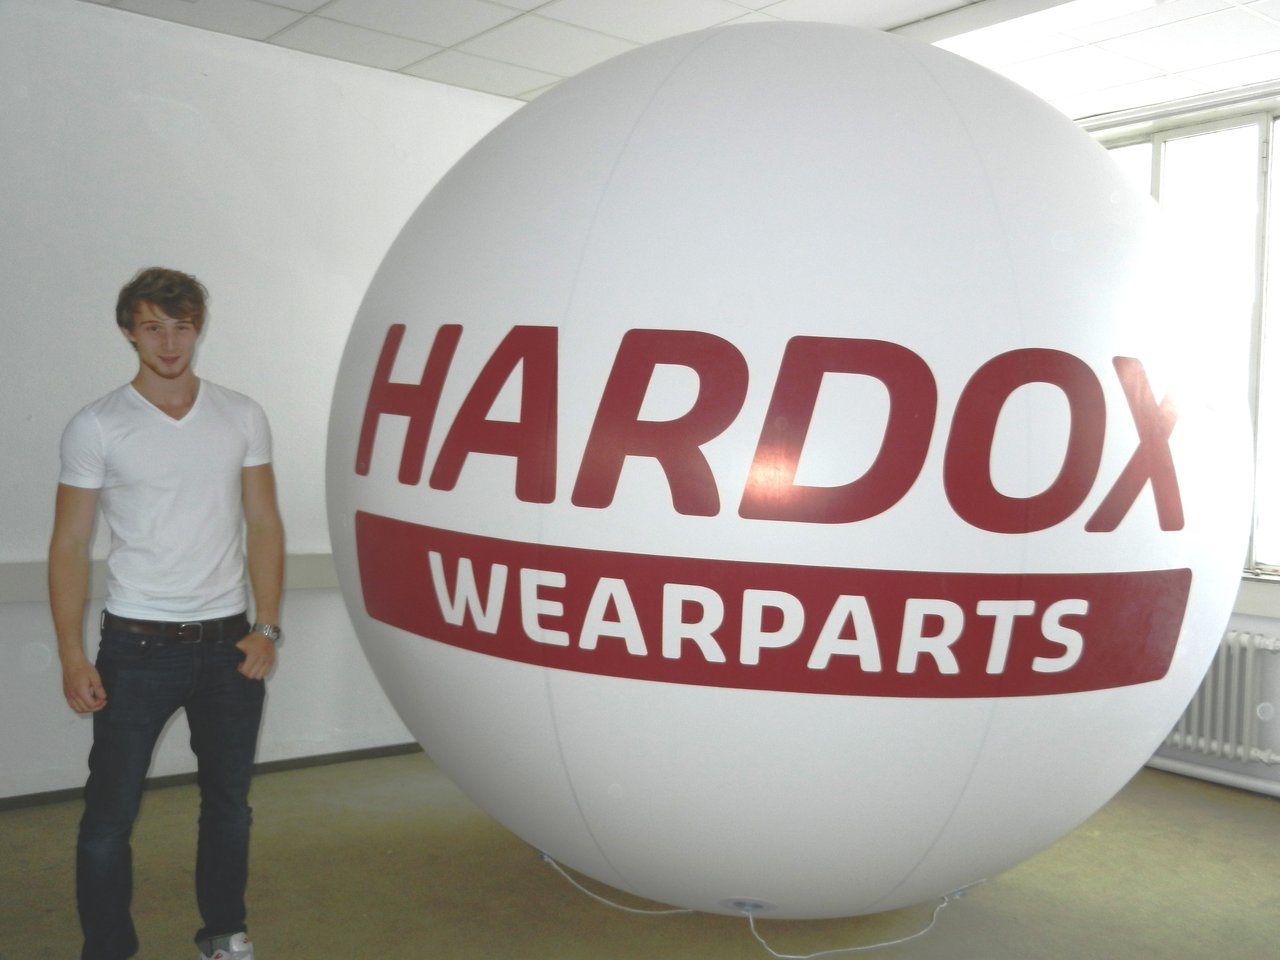 messeballon 3m durchmesser hochwertig inkl lieferung. Black Bedroom Furniture Sets. Home Design Ideas